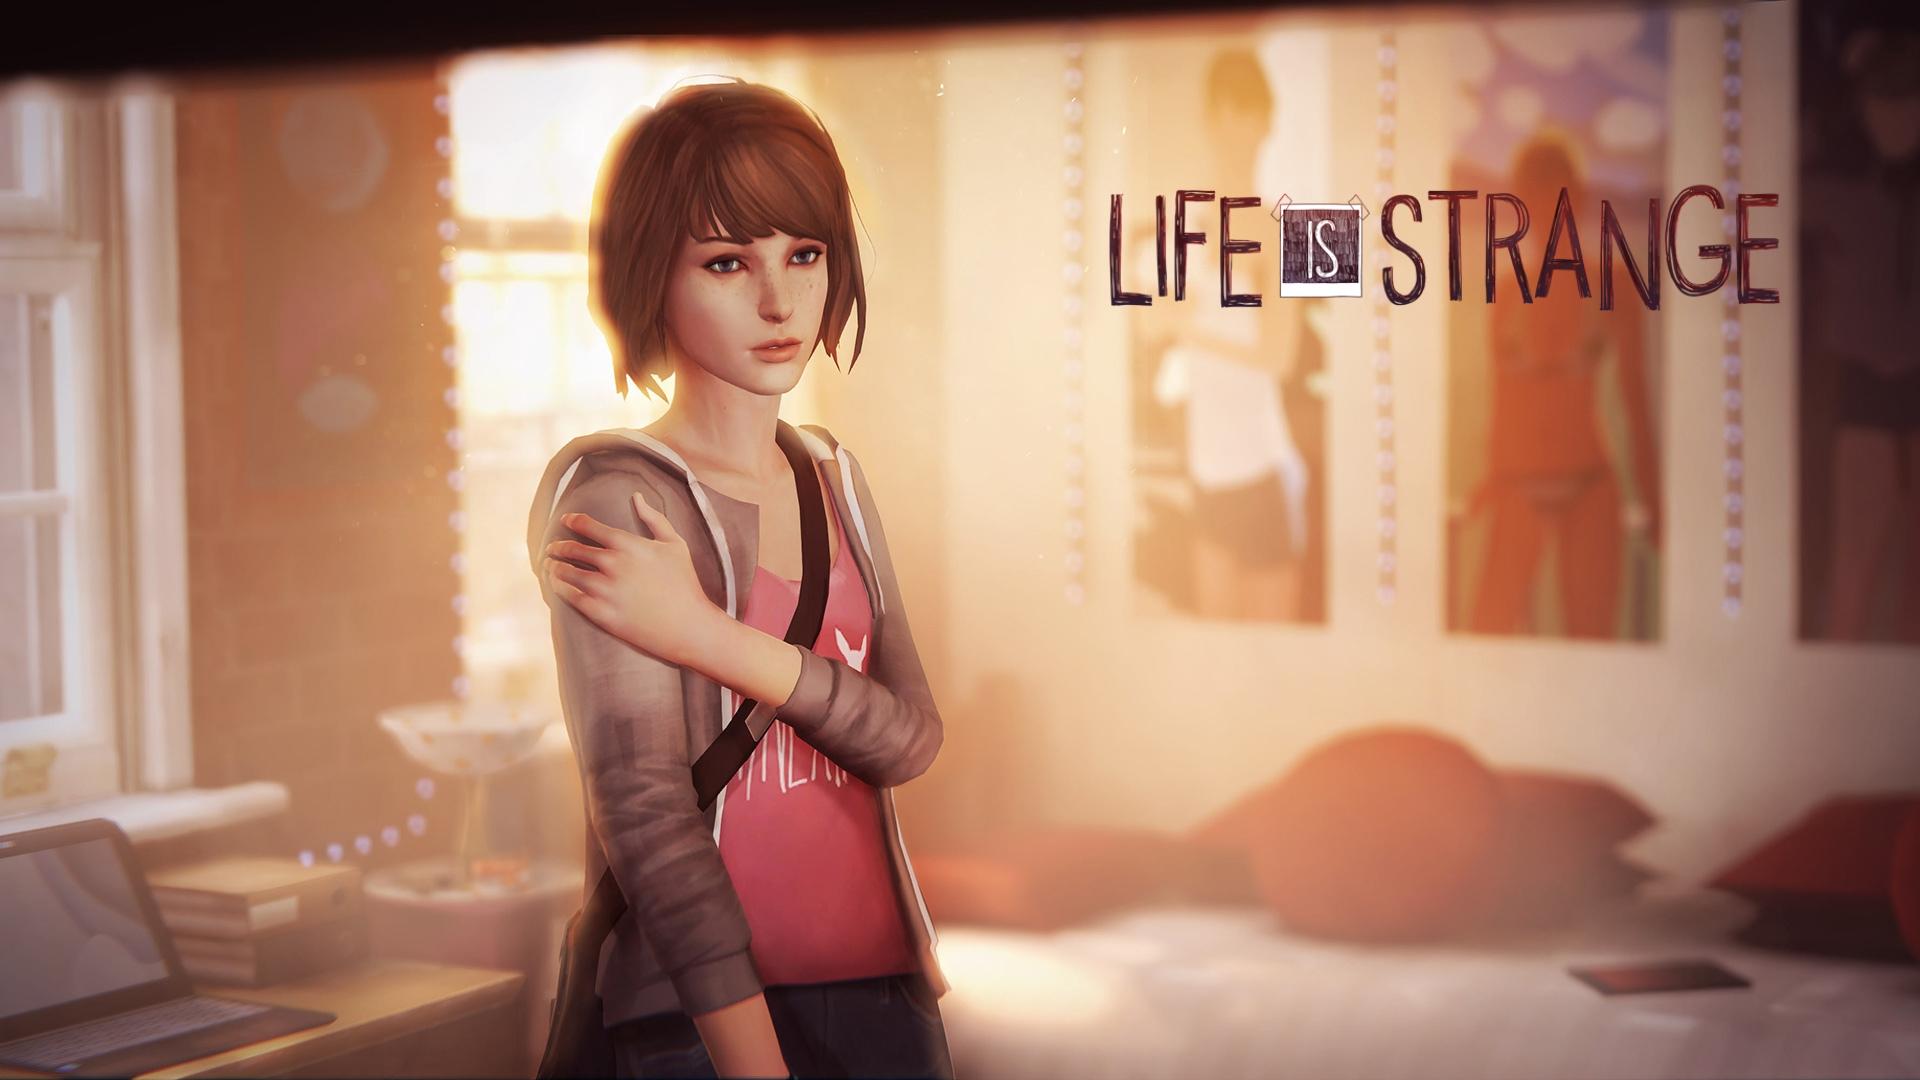 life_is_strange_wallpaper_by_miniwibik-d8fzn80.jpg